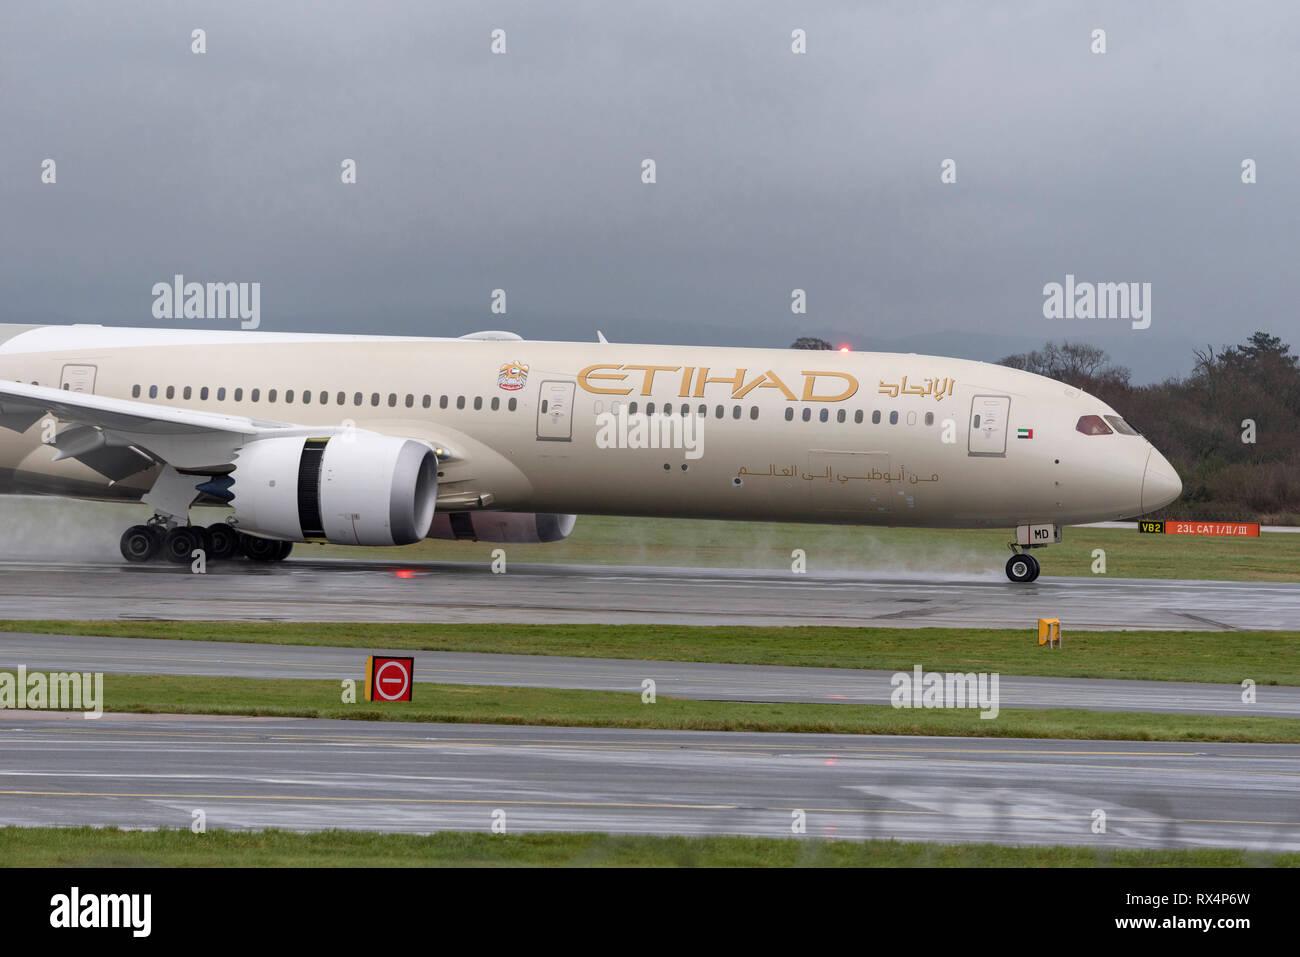 Etihad airlines Boeing Dreamliner. - Stock Image